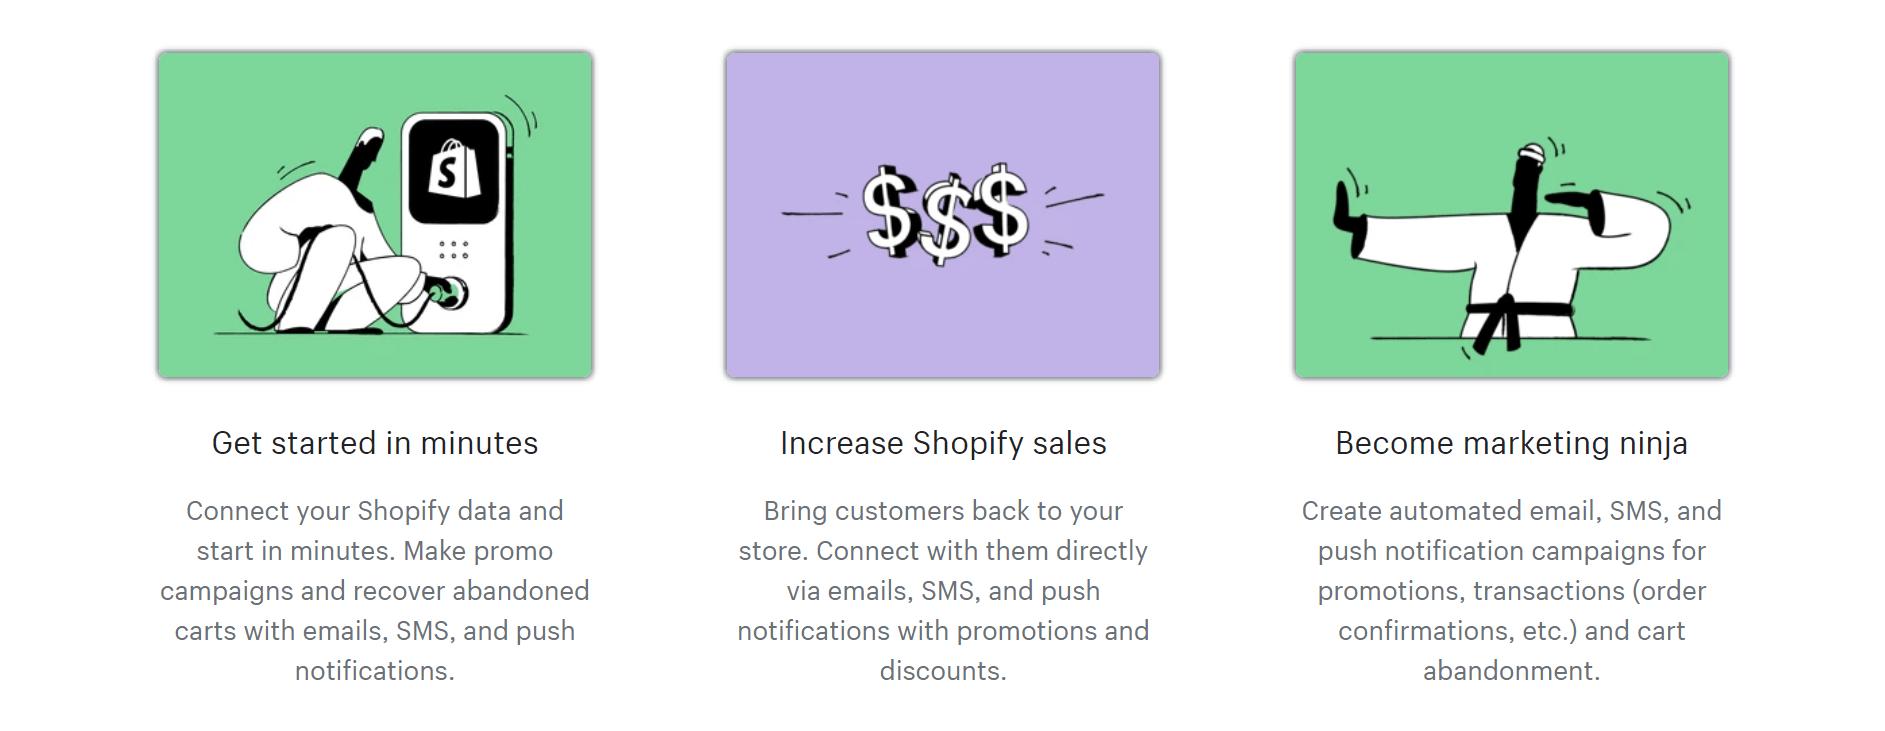 Firepush app benefits